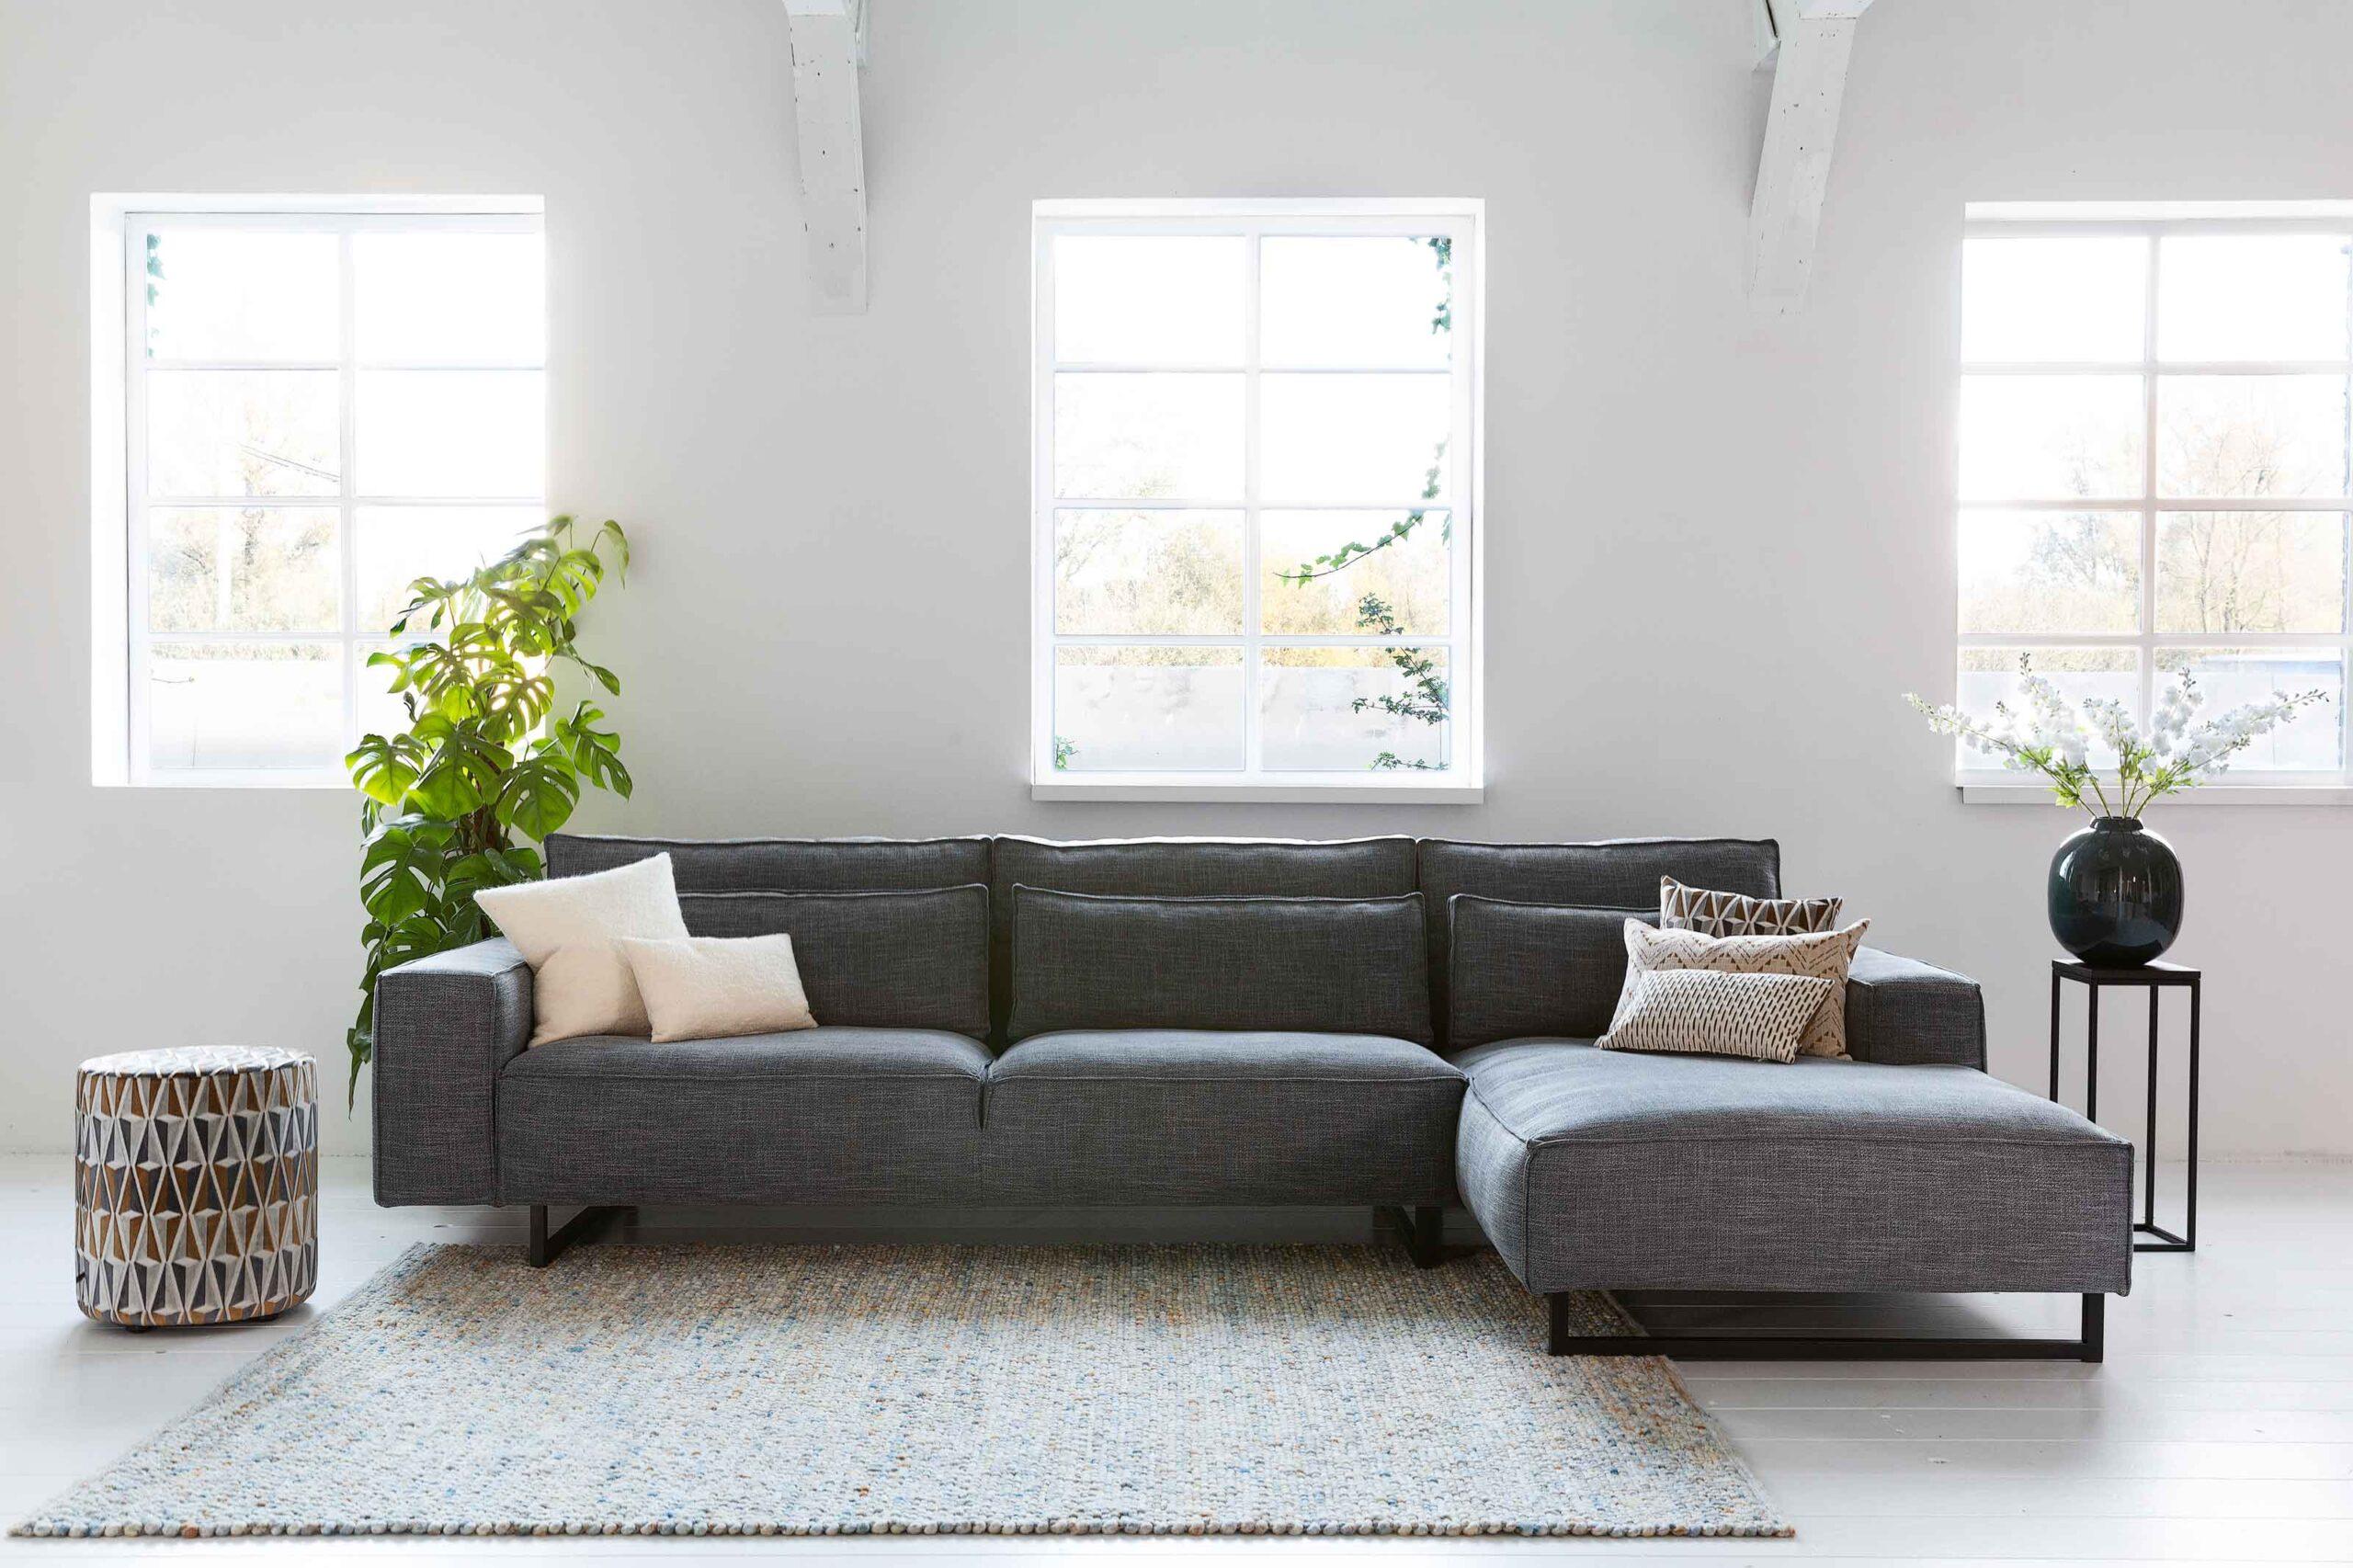 vivre-de-provence-zitbank-longchair-kleur-grijs-industiele-poten-soofs-interieur